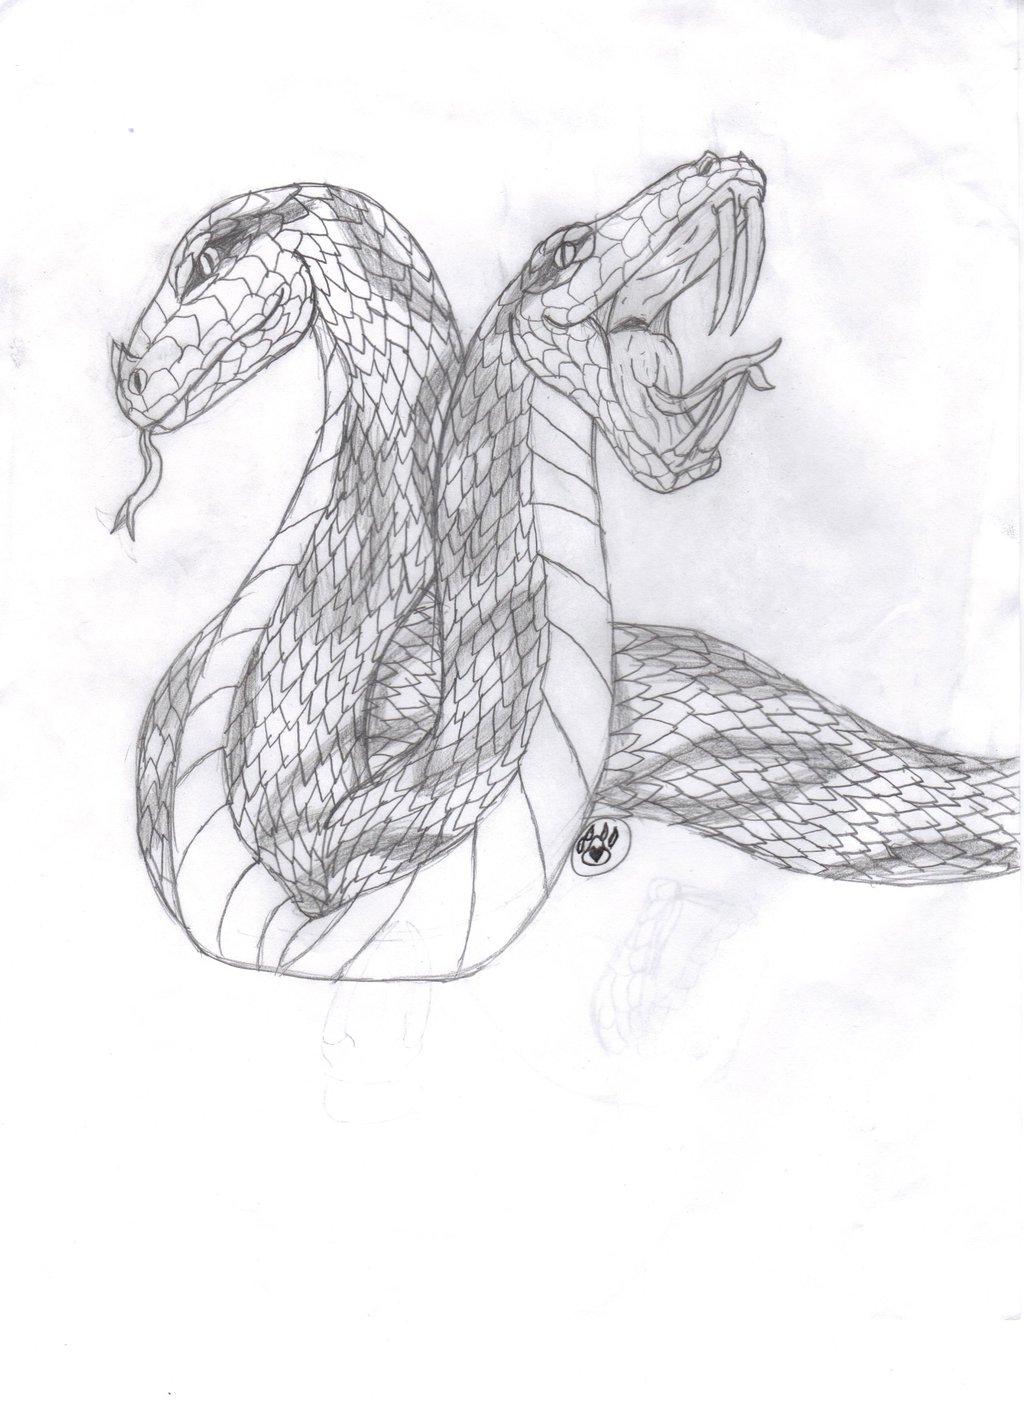 Drawn werewolf snake head Head snake Drawing Headed Two